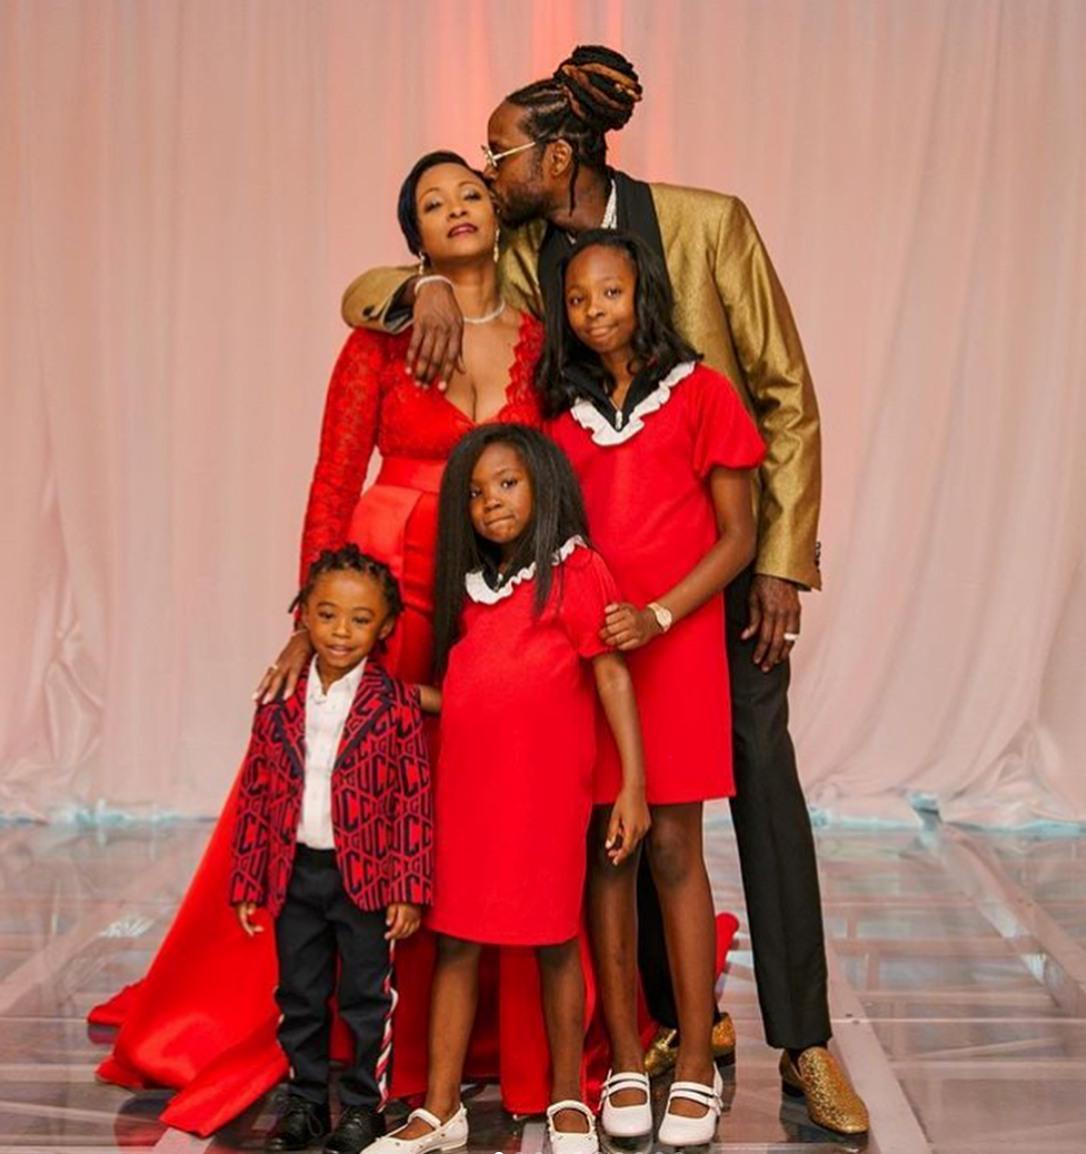 2 Chainz Marries Longtime Girlfriend Kesha In Miami Photos 9